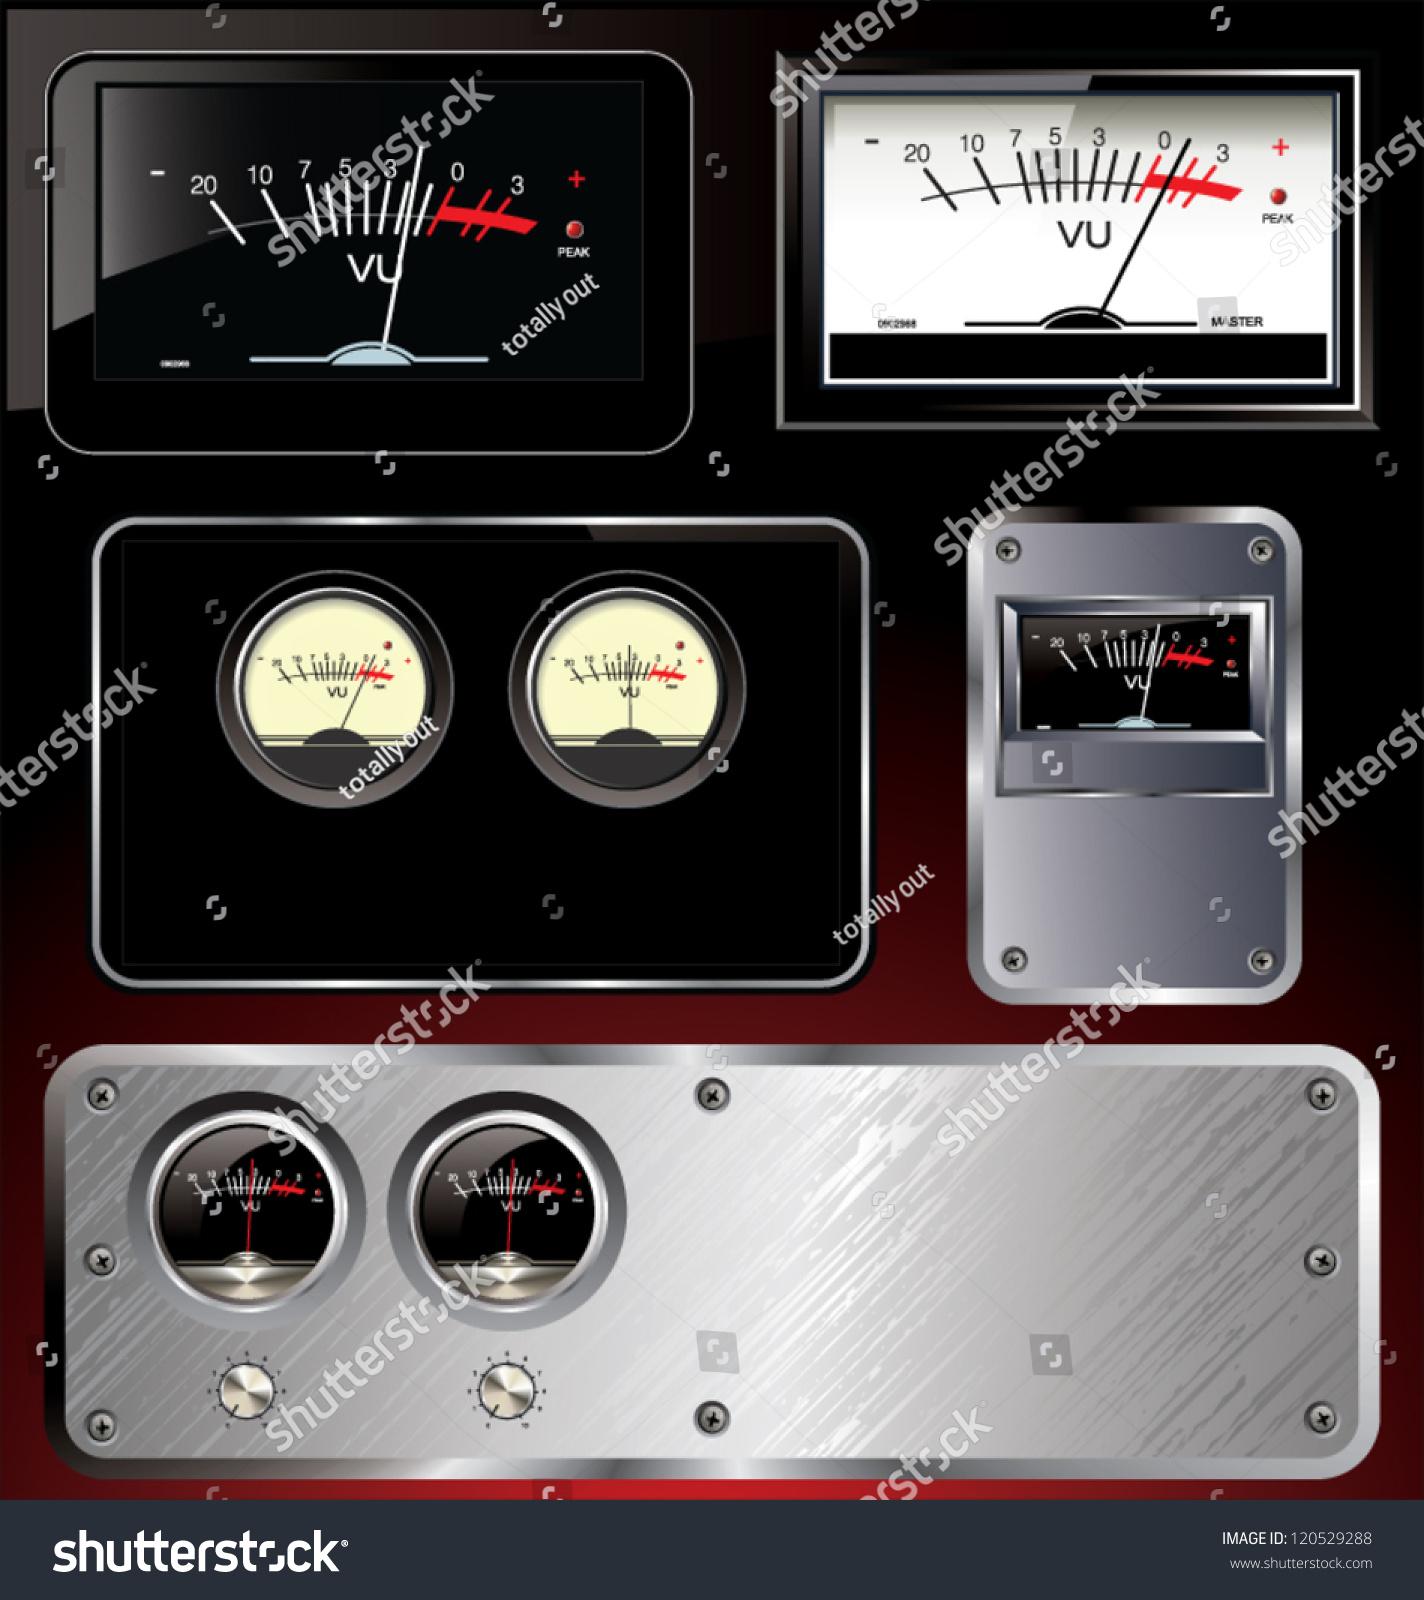 Analog Meter Background : Analog vu meter abstract background set stock vector